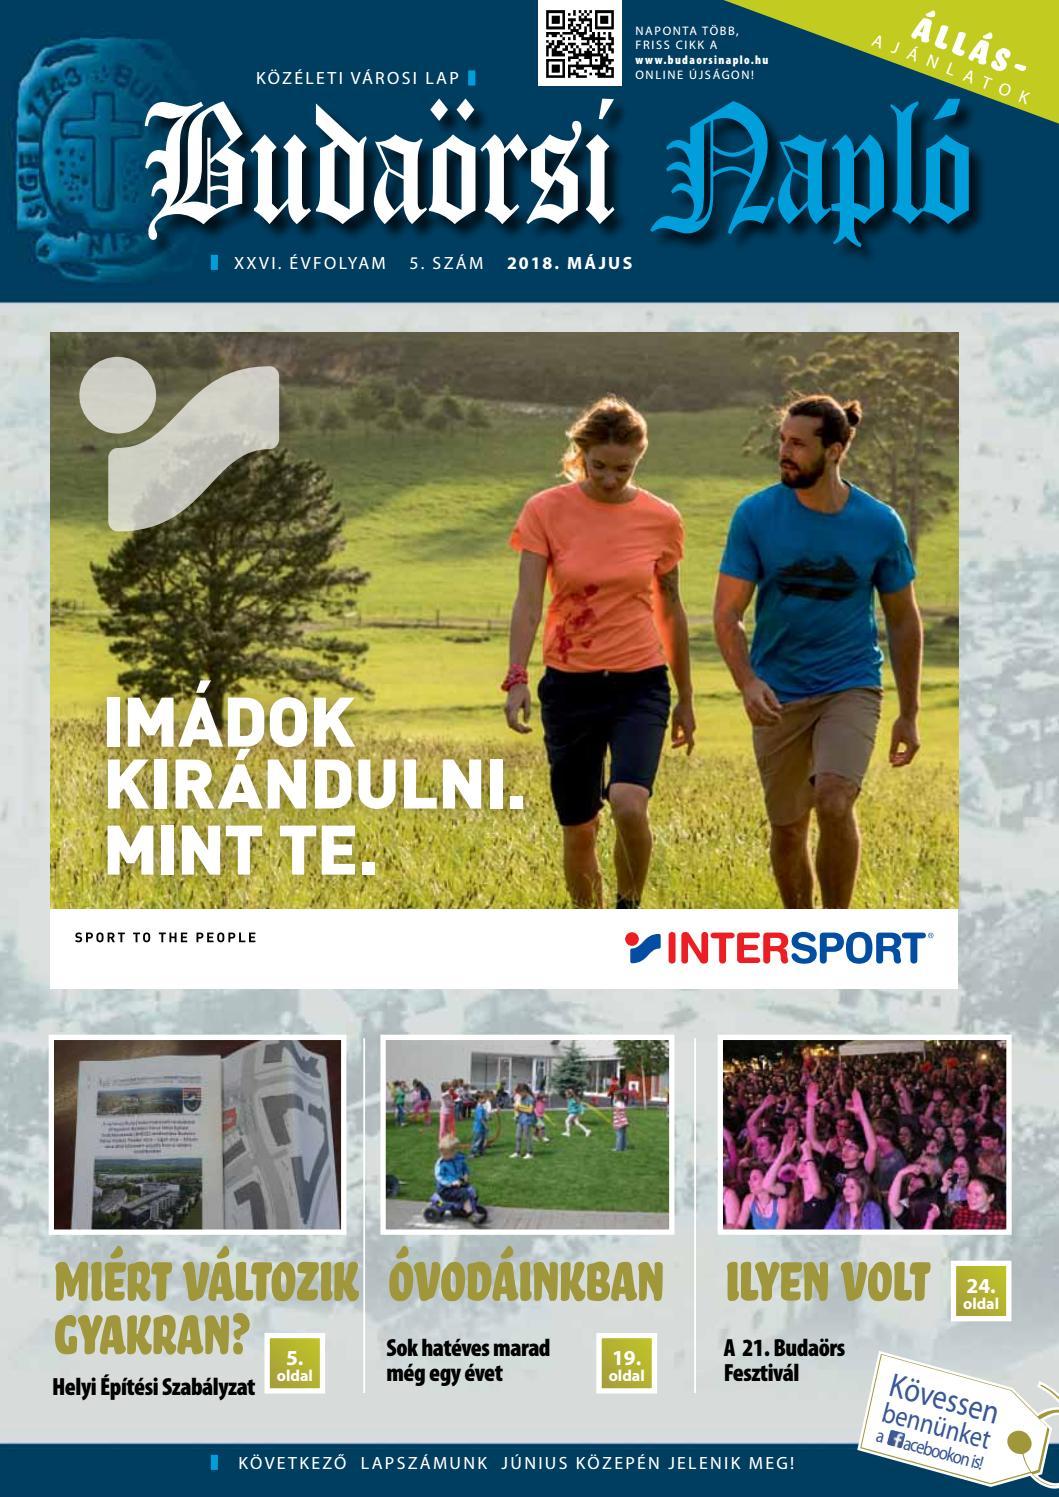 14e67e67db Budaörsi Napló - 2018. május by Zoltán Kaszás - issuu